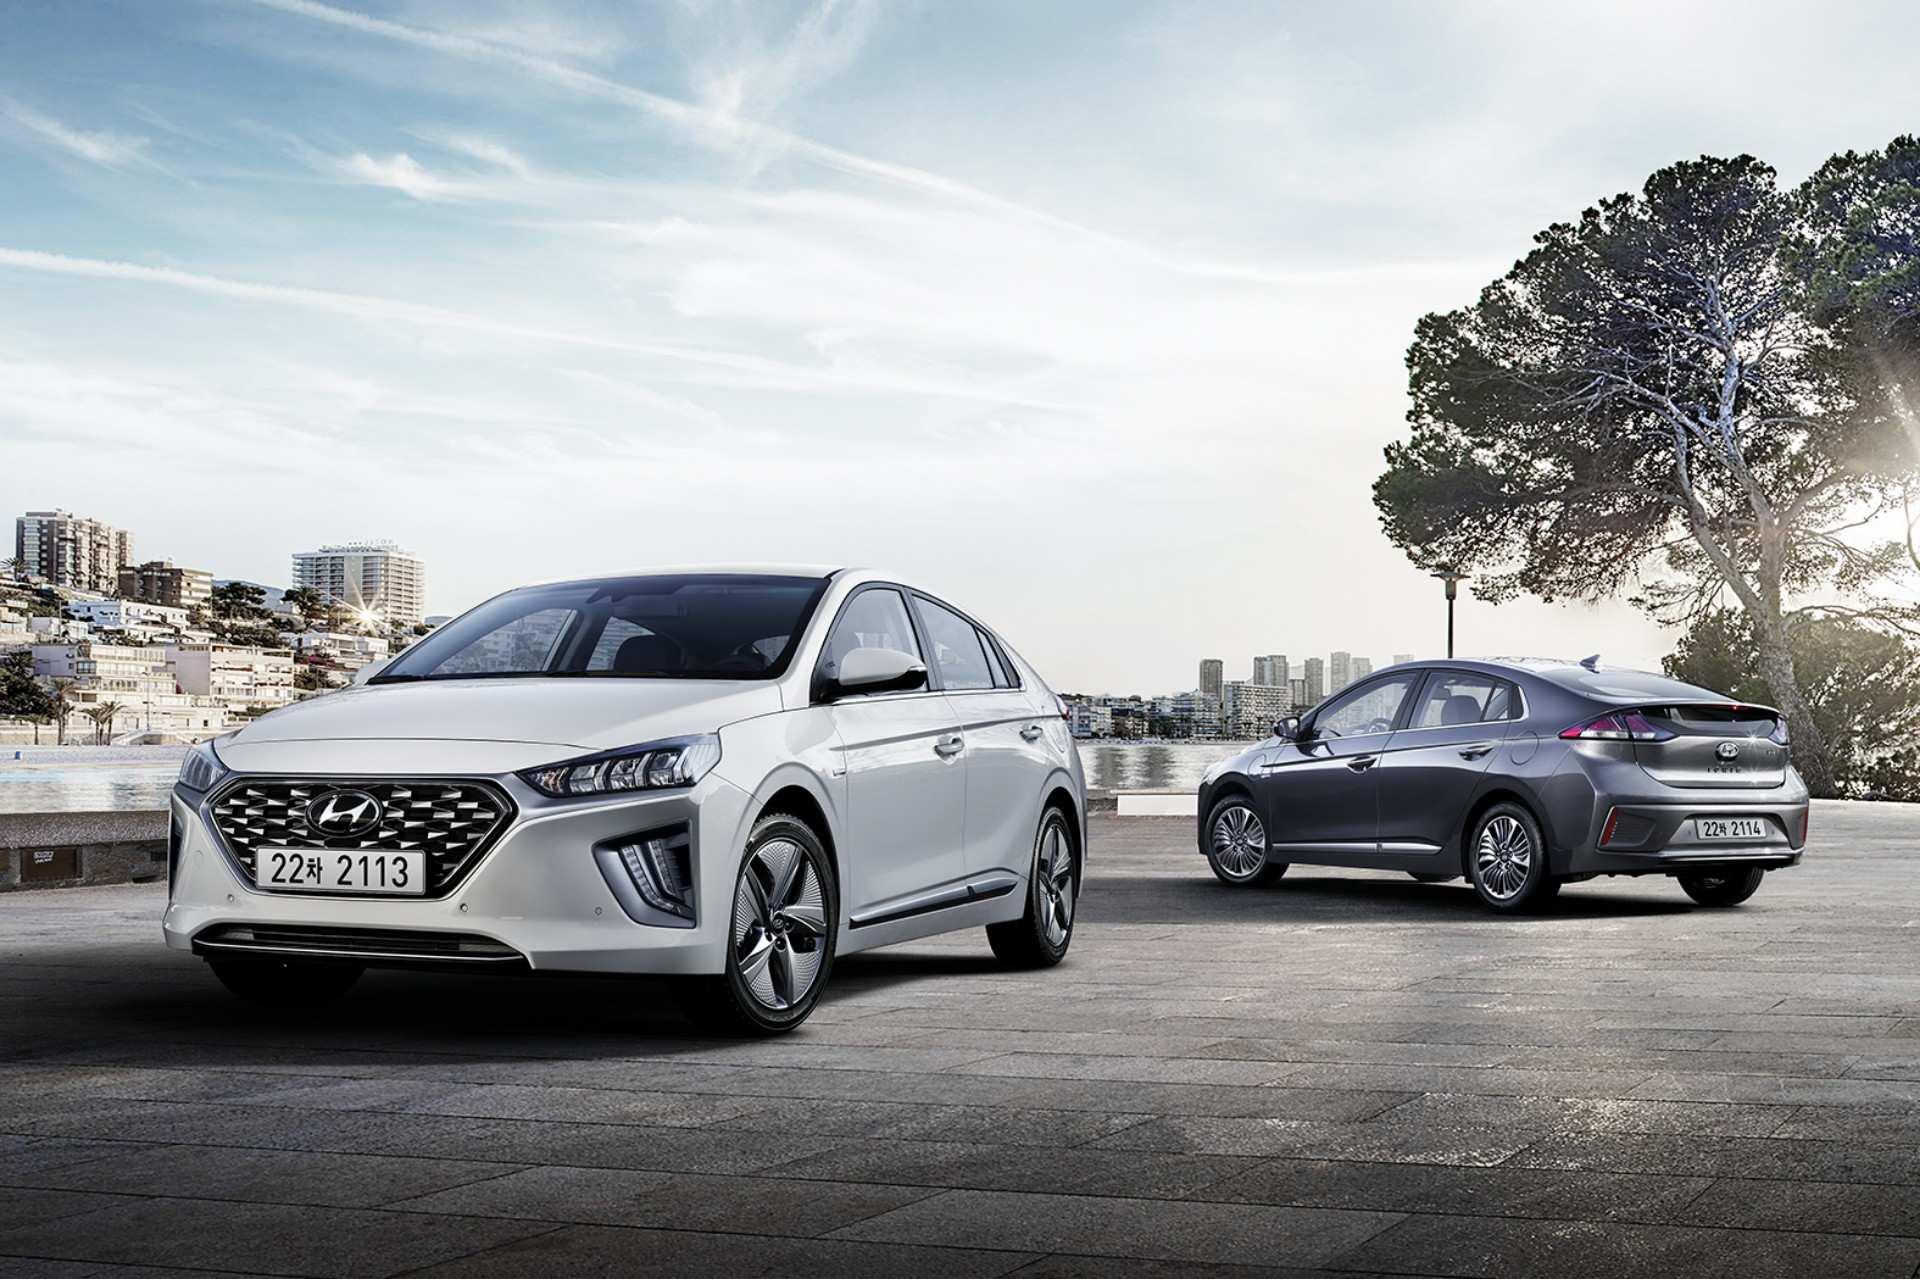 58 All New 2020 Hyundai Lineup Speed Test by 2020 Hyundai Lineup